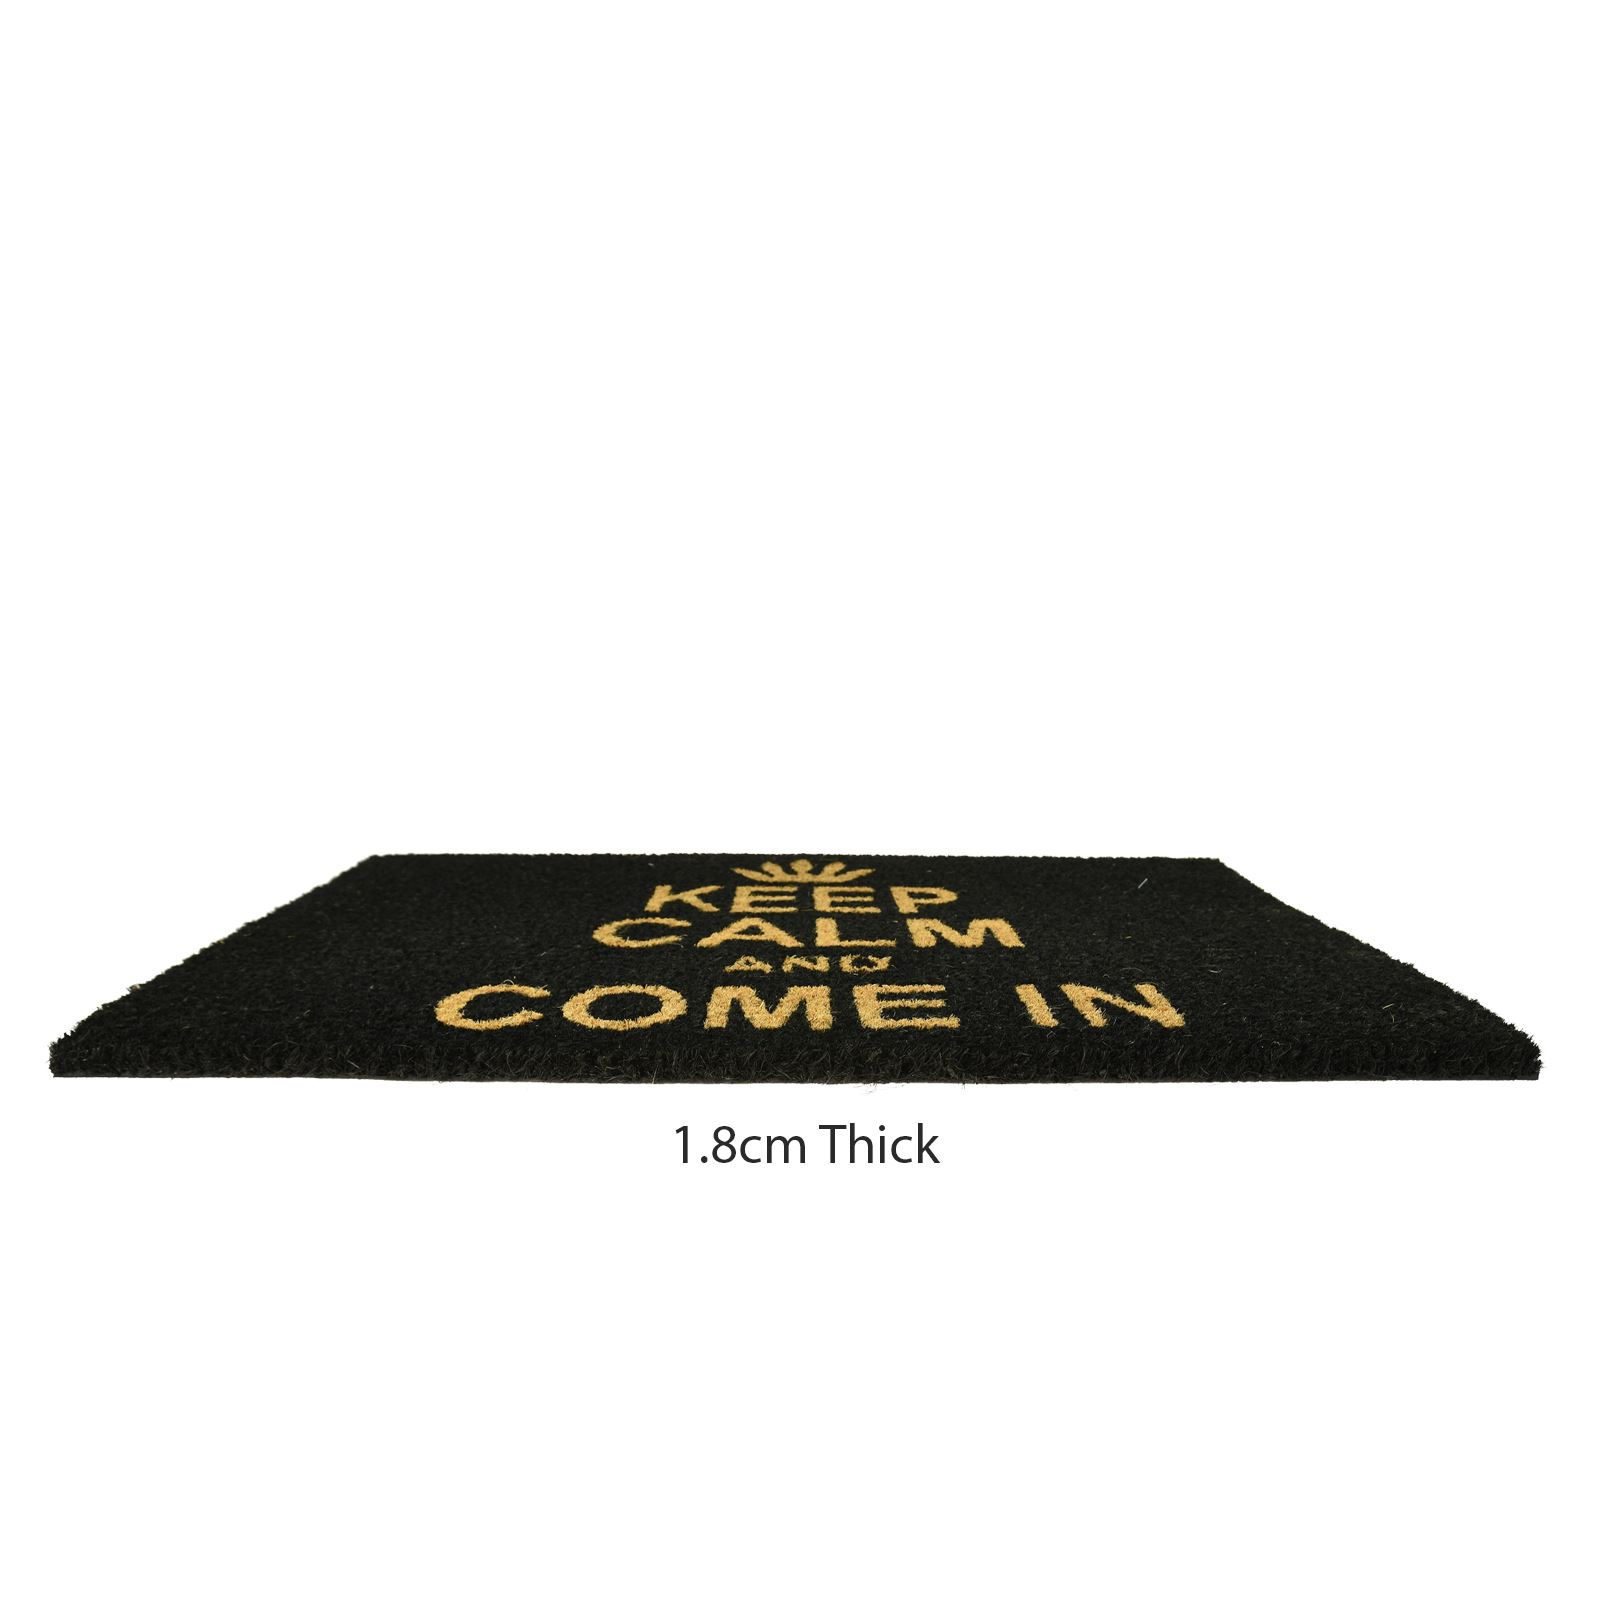 Plain-Non-Slip-Door-Mat-Tough-Natural-Coir-PVC-Back-Welcome-Doormat-40-x-60cm miniatura 77